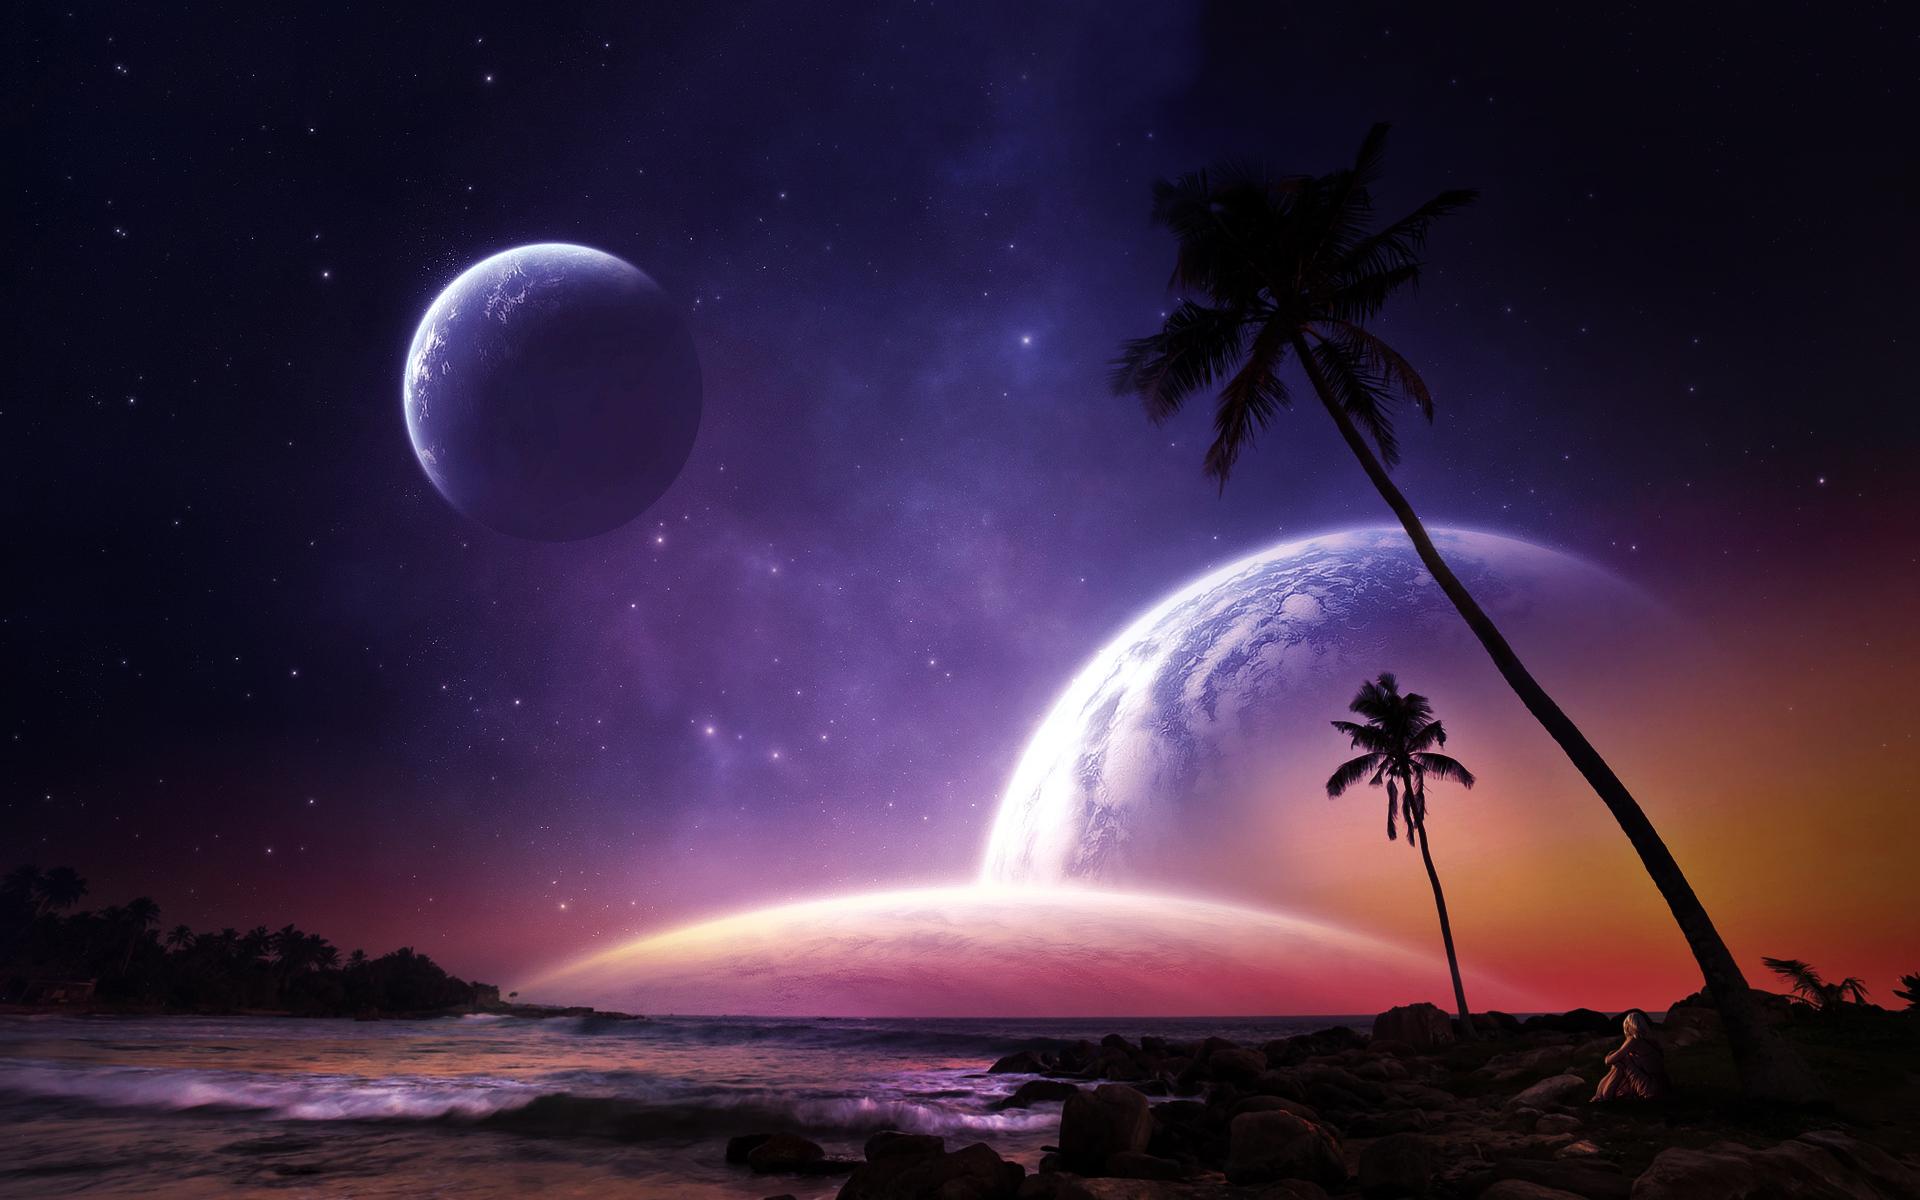 Fantasy dreamworld